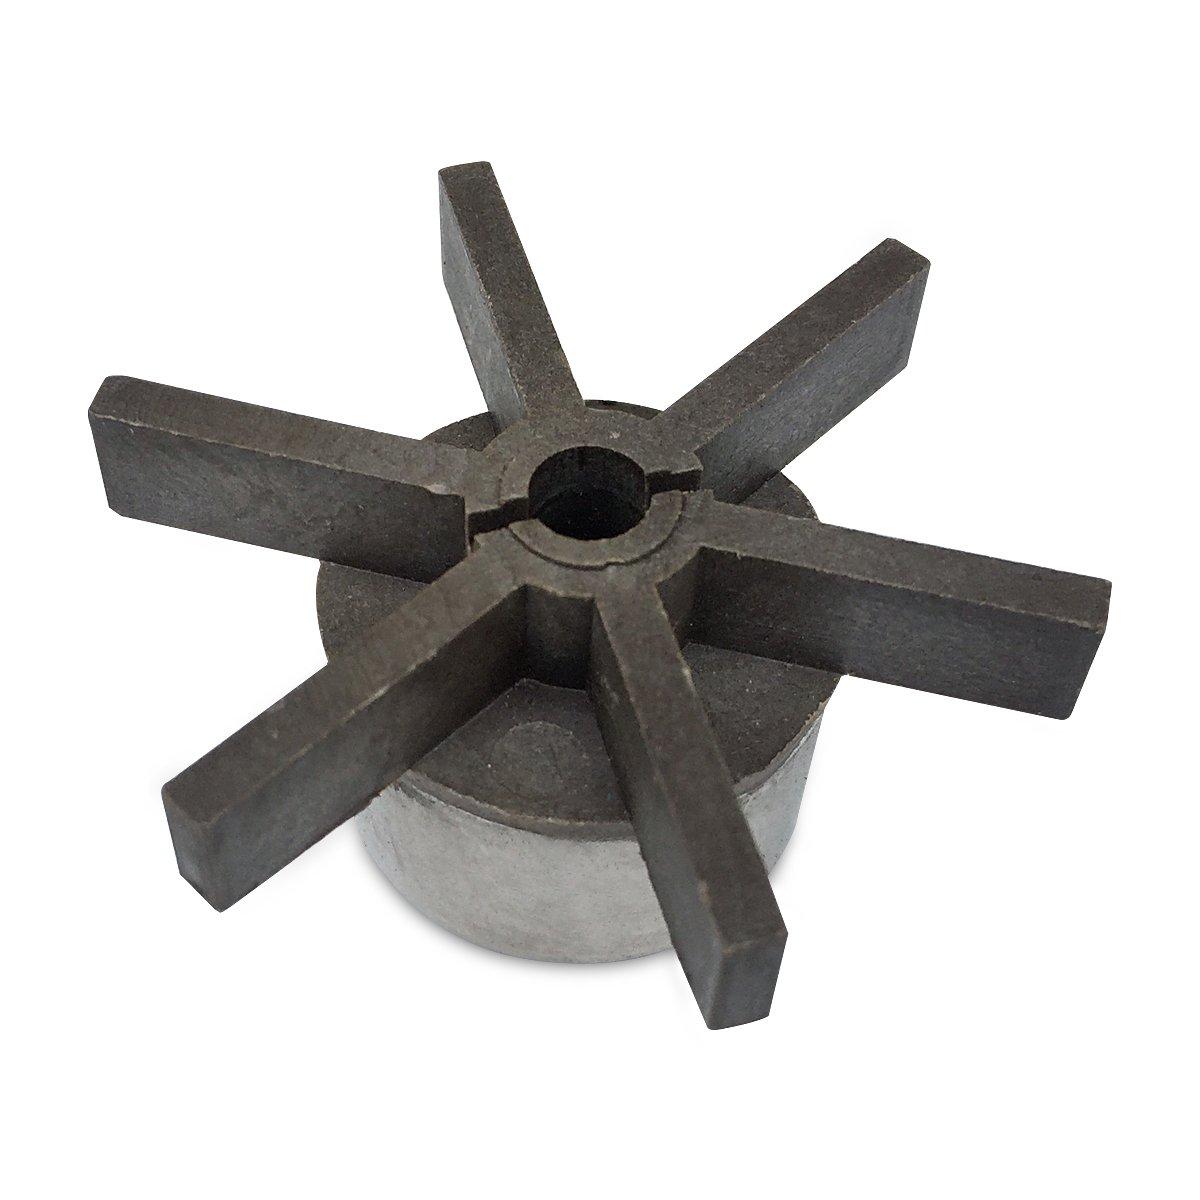 Chugger Pumps CP-25 Impeller